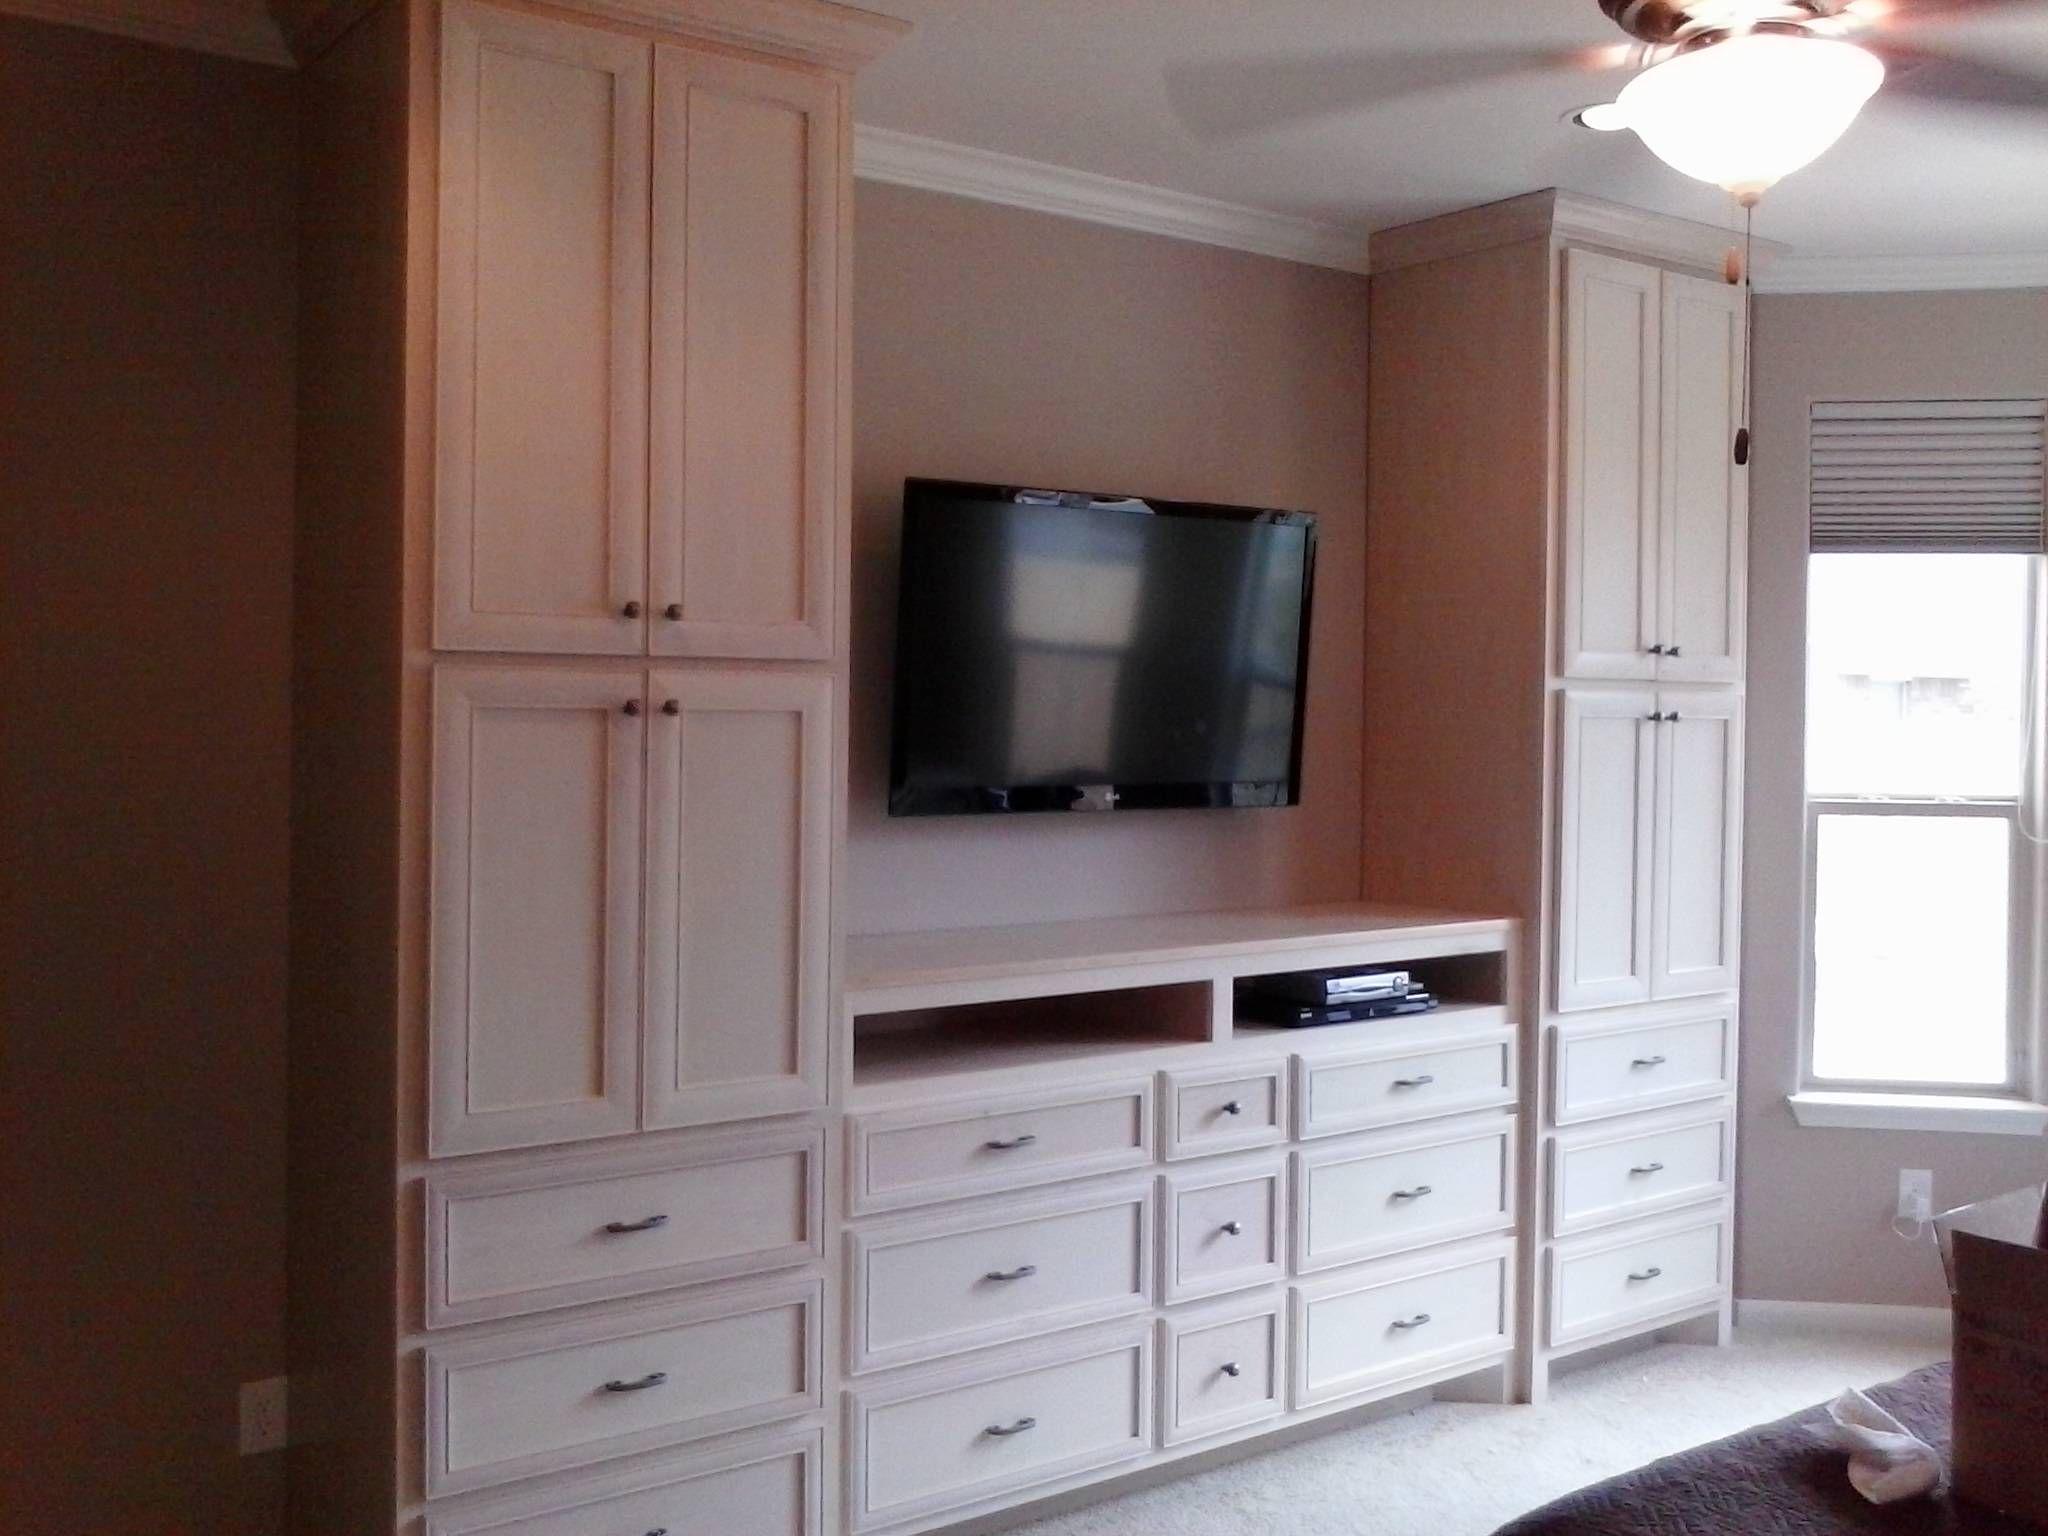 Breathtaking White Teak Wood Polished Bedroom Wall Units With